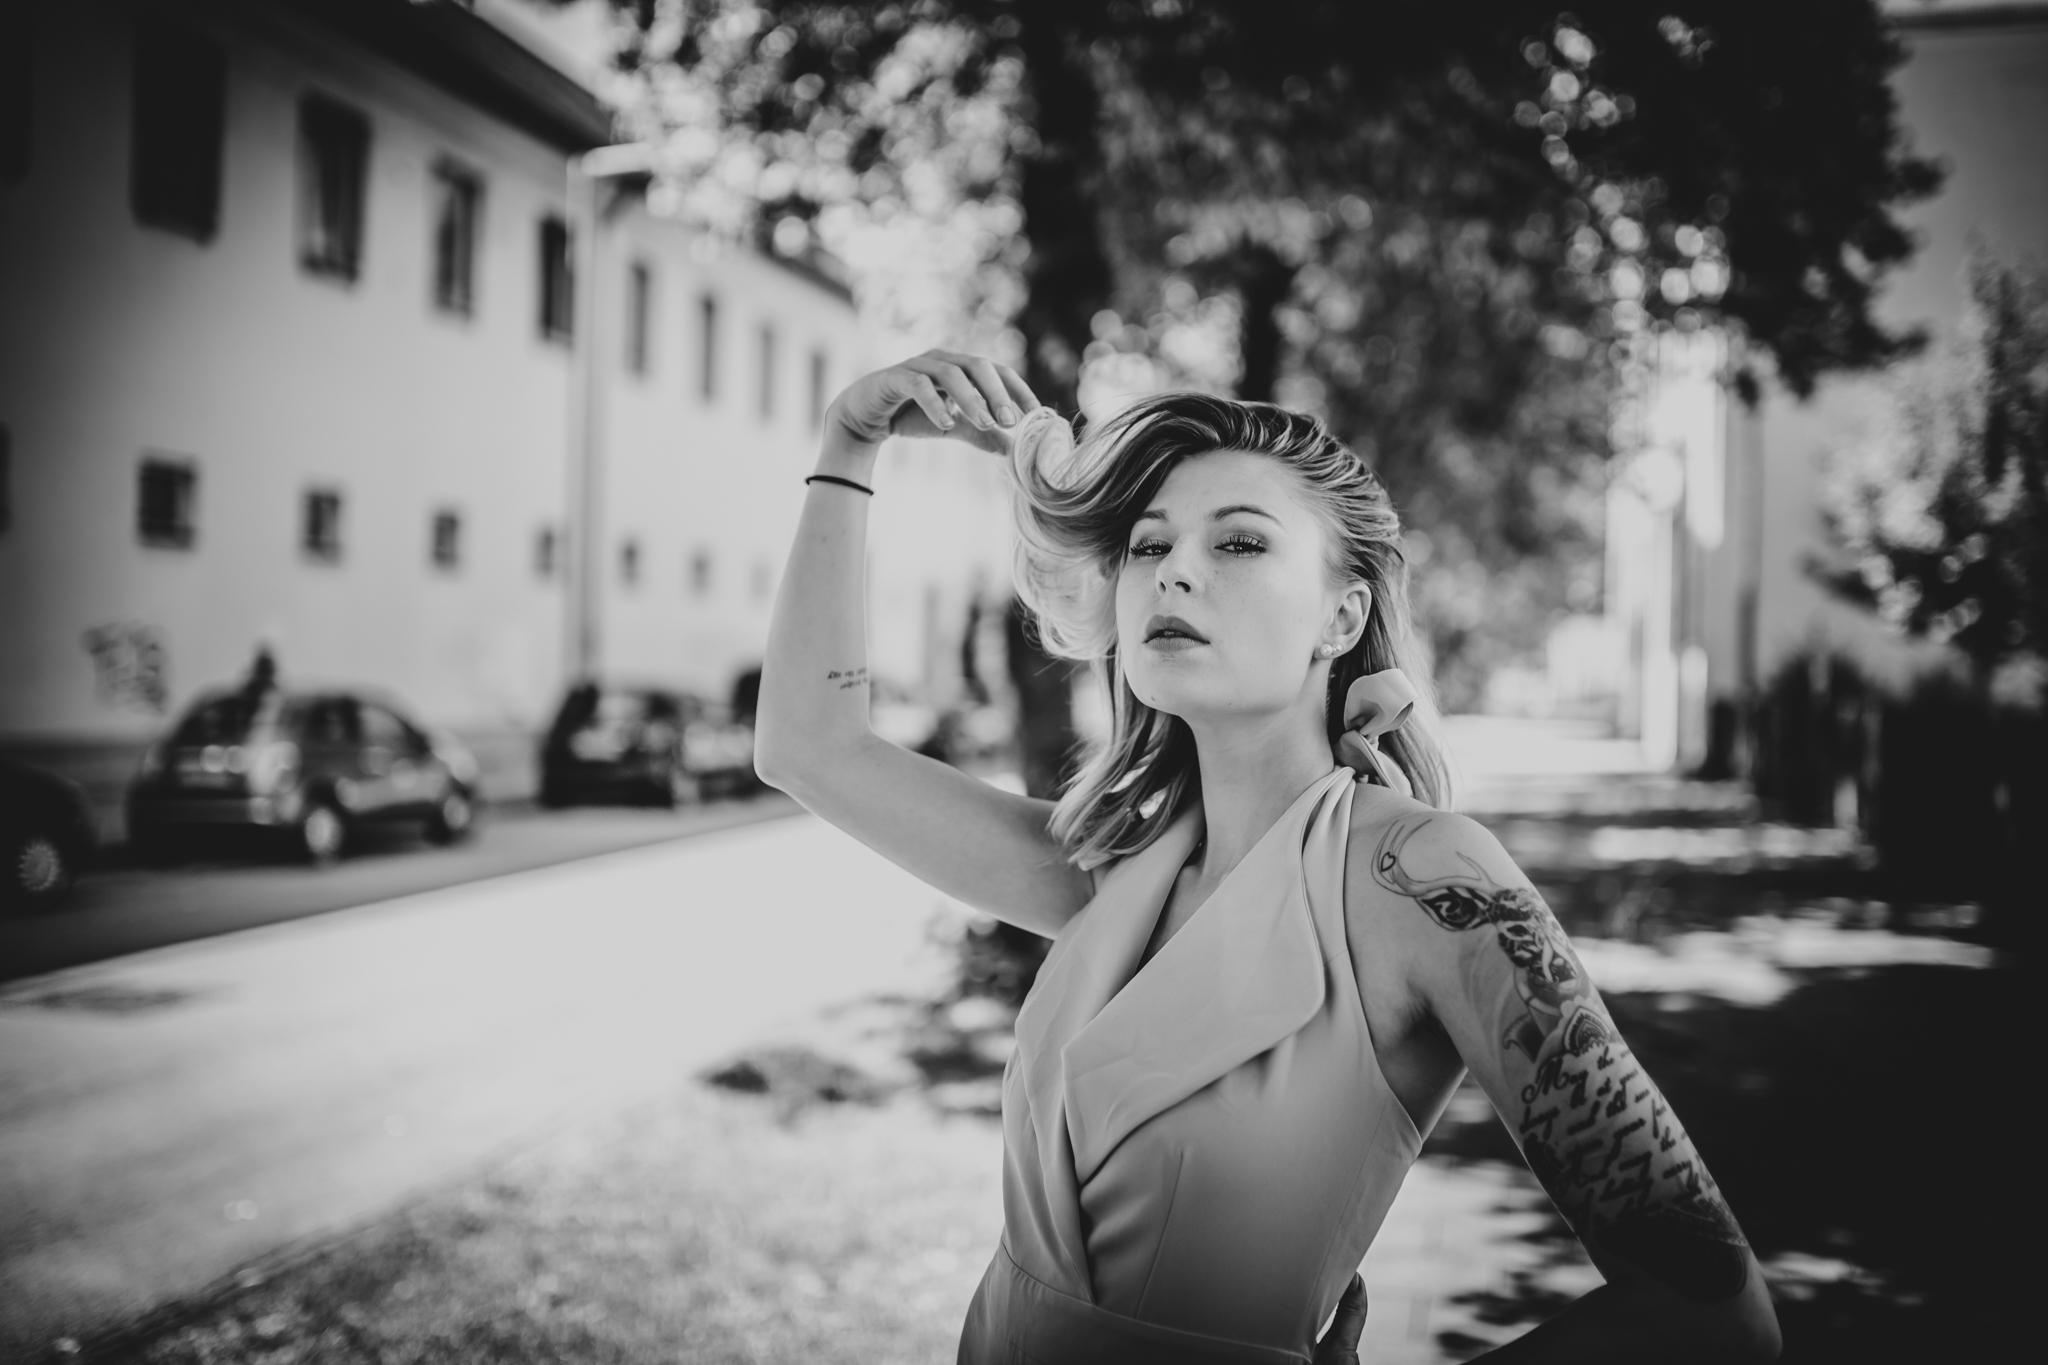 Zoe_CircusKrone_20170814_IMG_1265-2.jpg